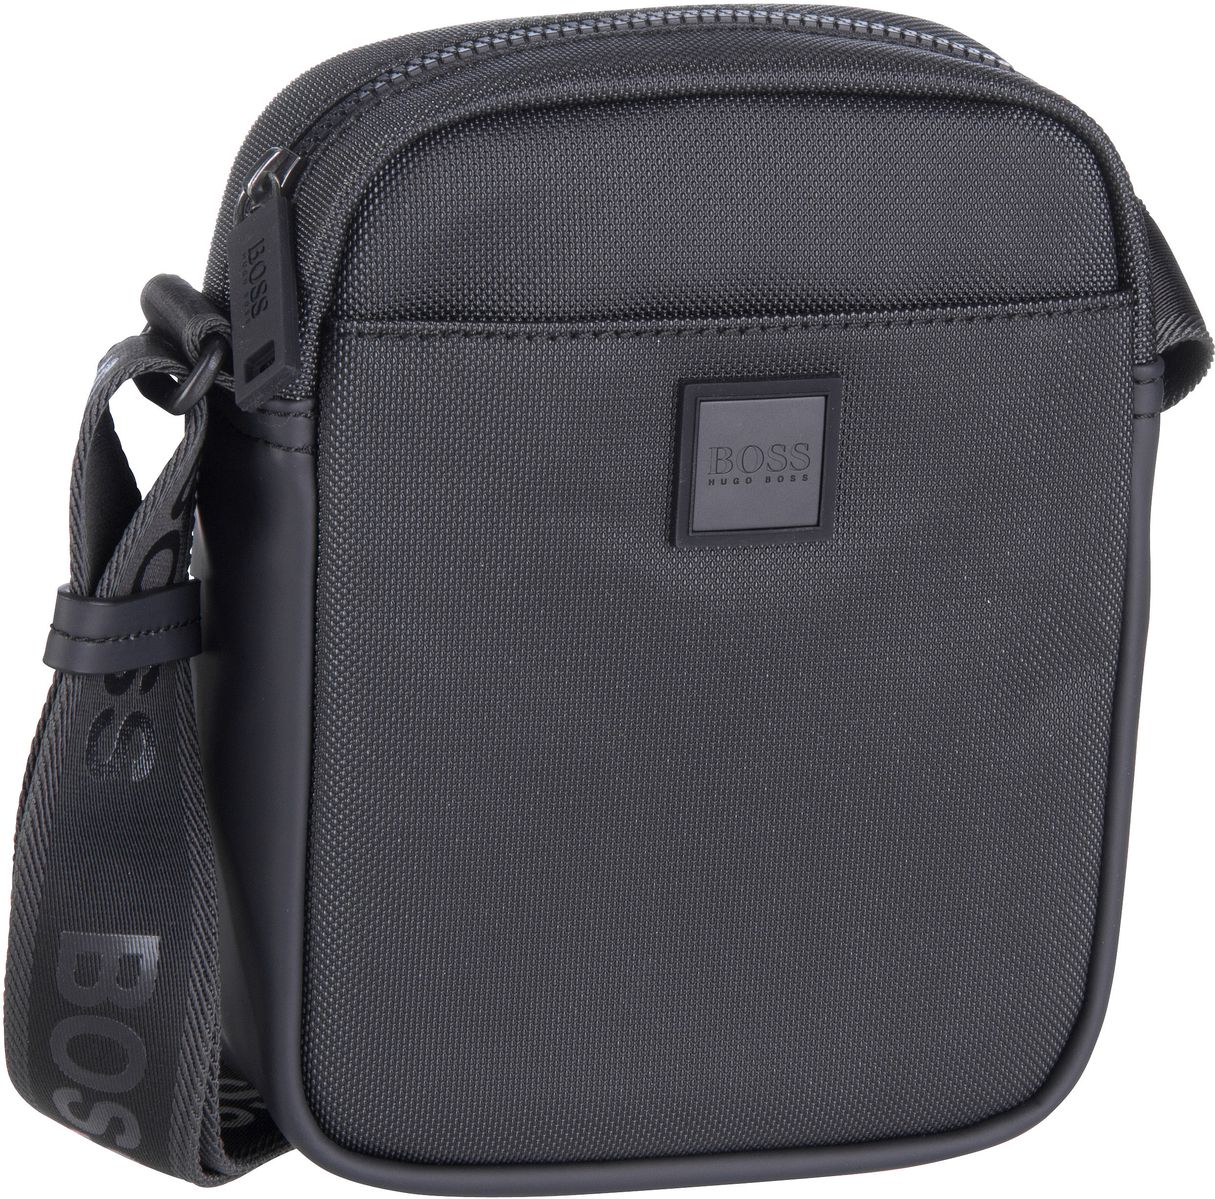 Umhängetasche Hyper Zip Bag 428688 Black